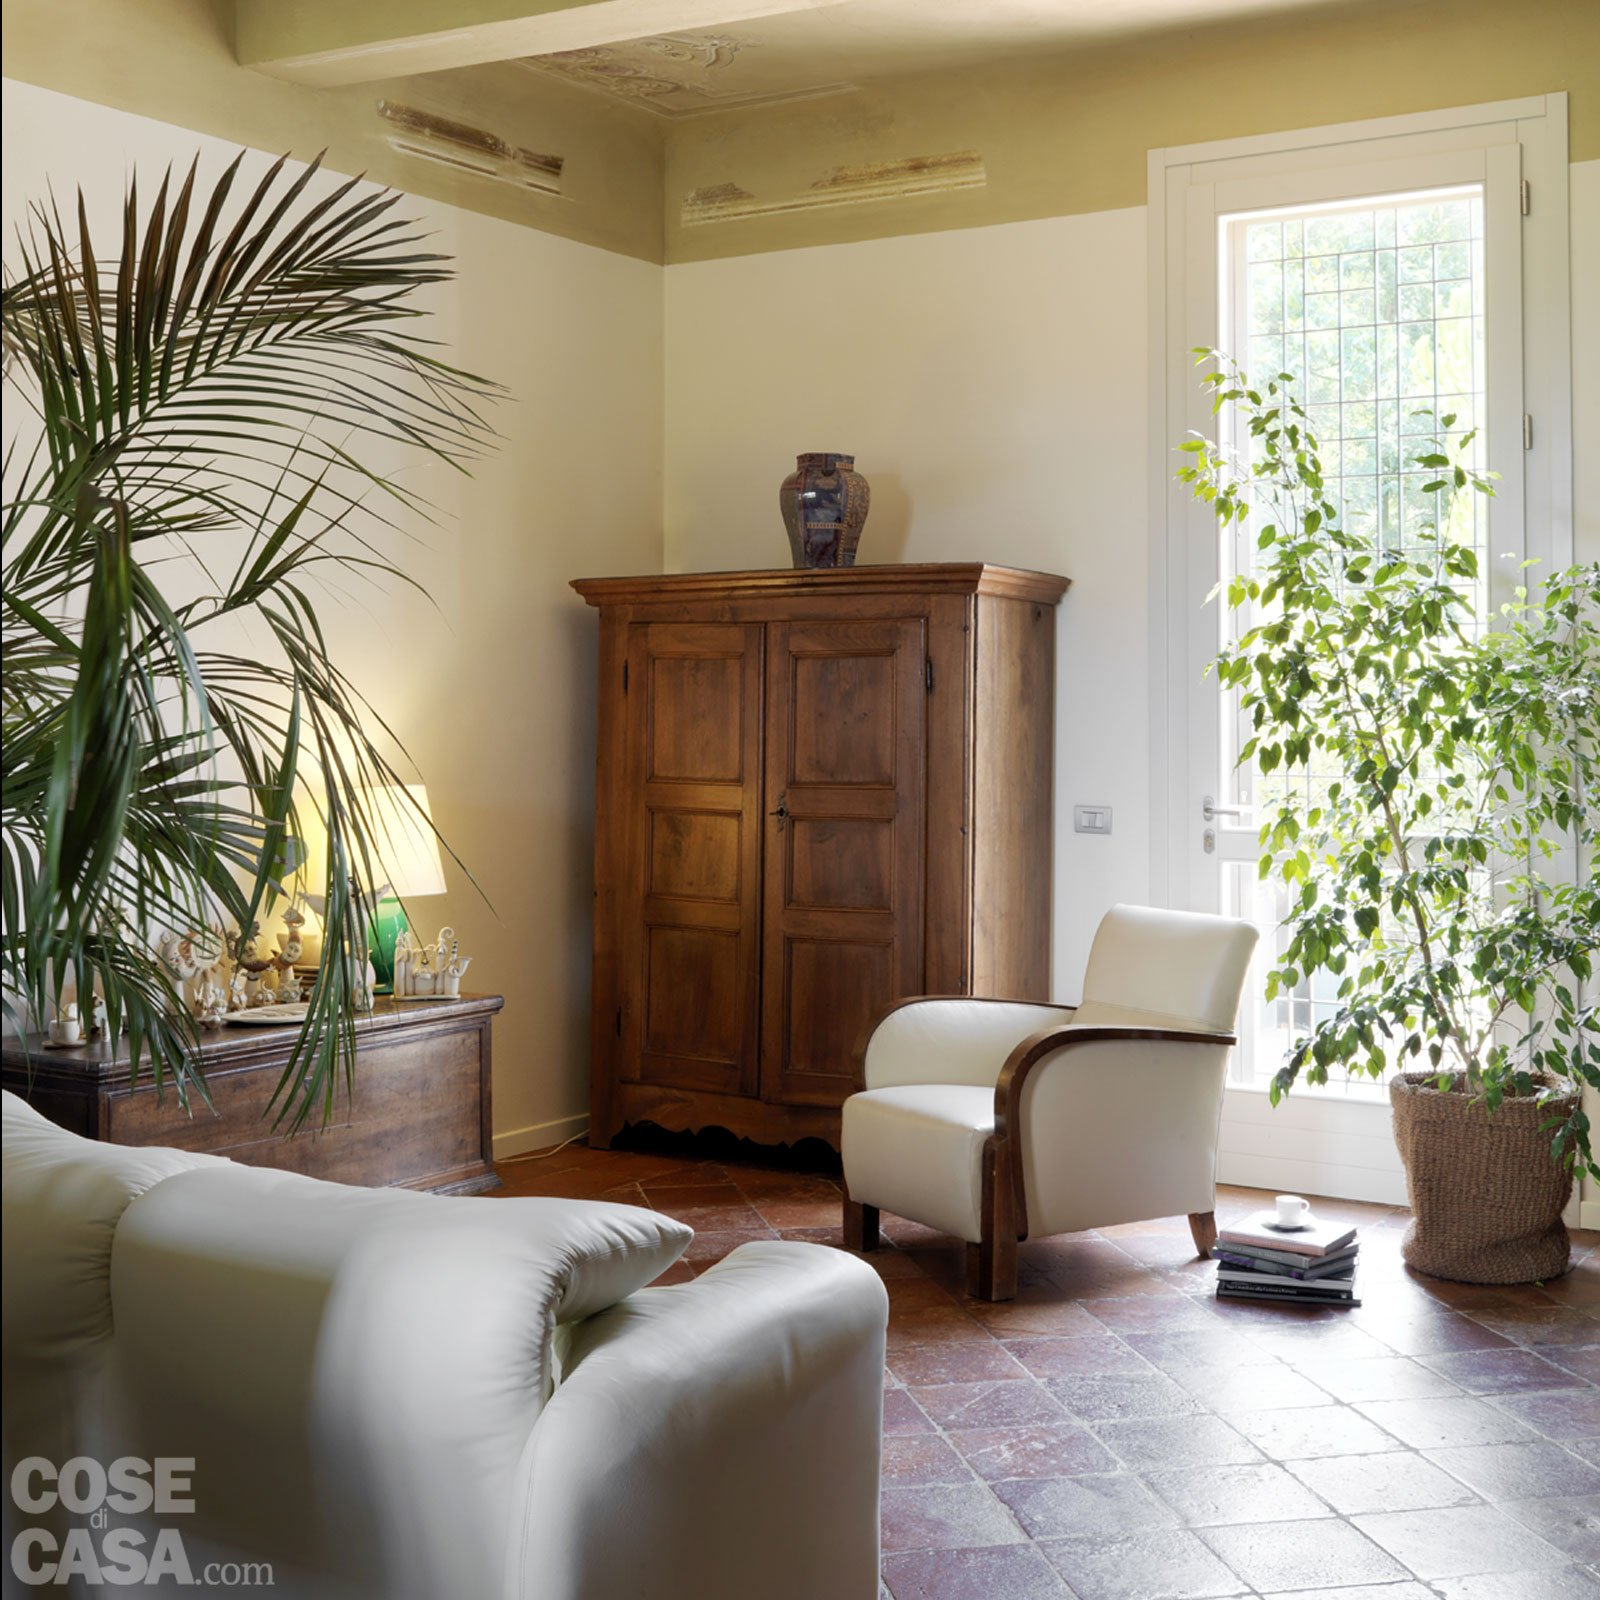 Arredamenti interni moderni arredamenti interni moderni for Arredamenti moderni casa